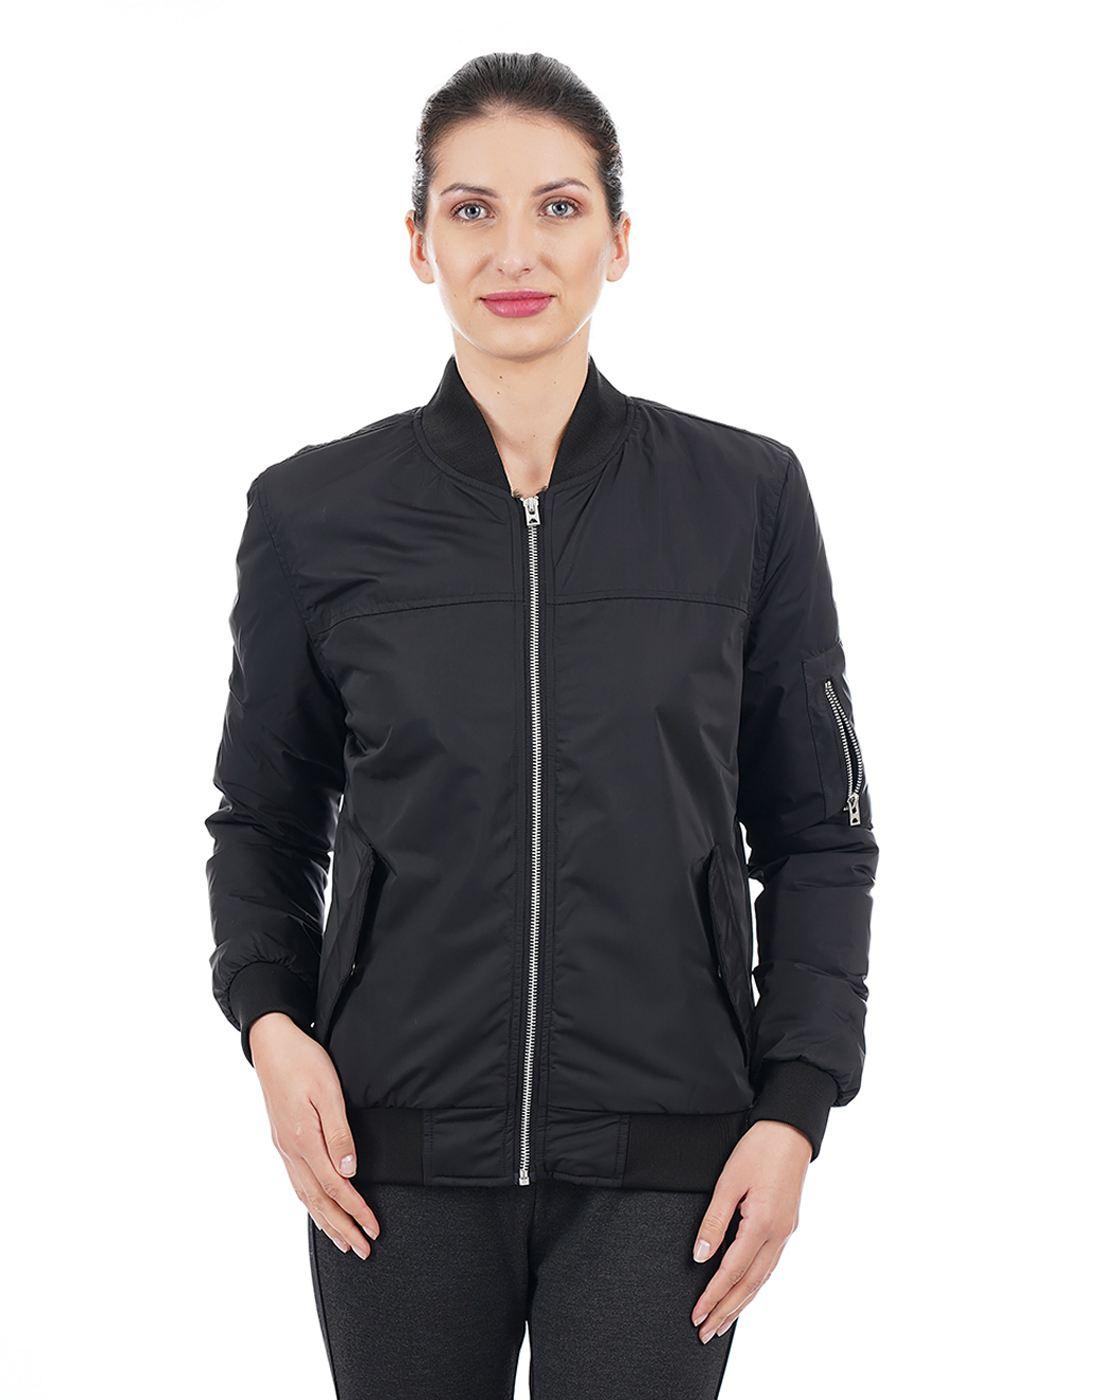 Aeropostale Women Black Sweatshirt